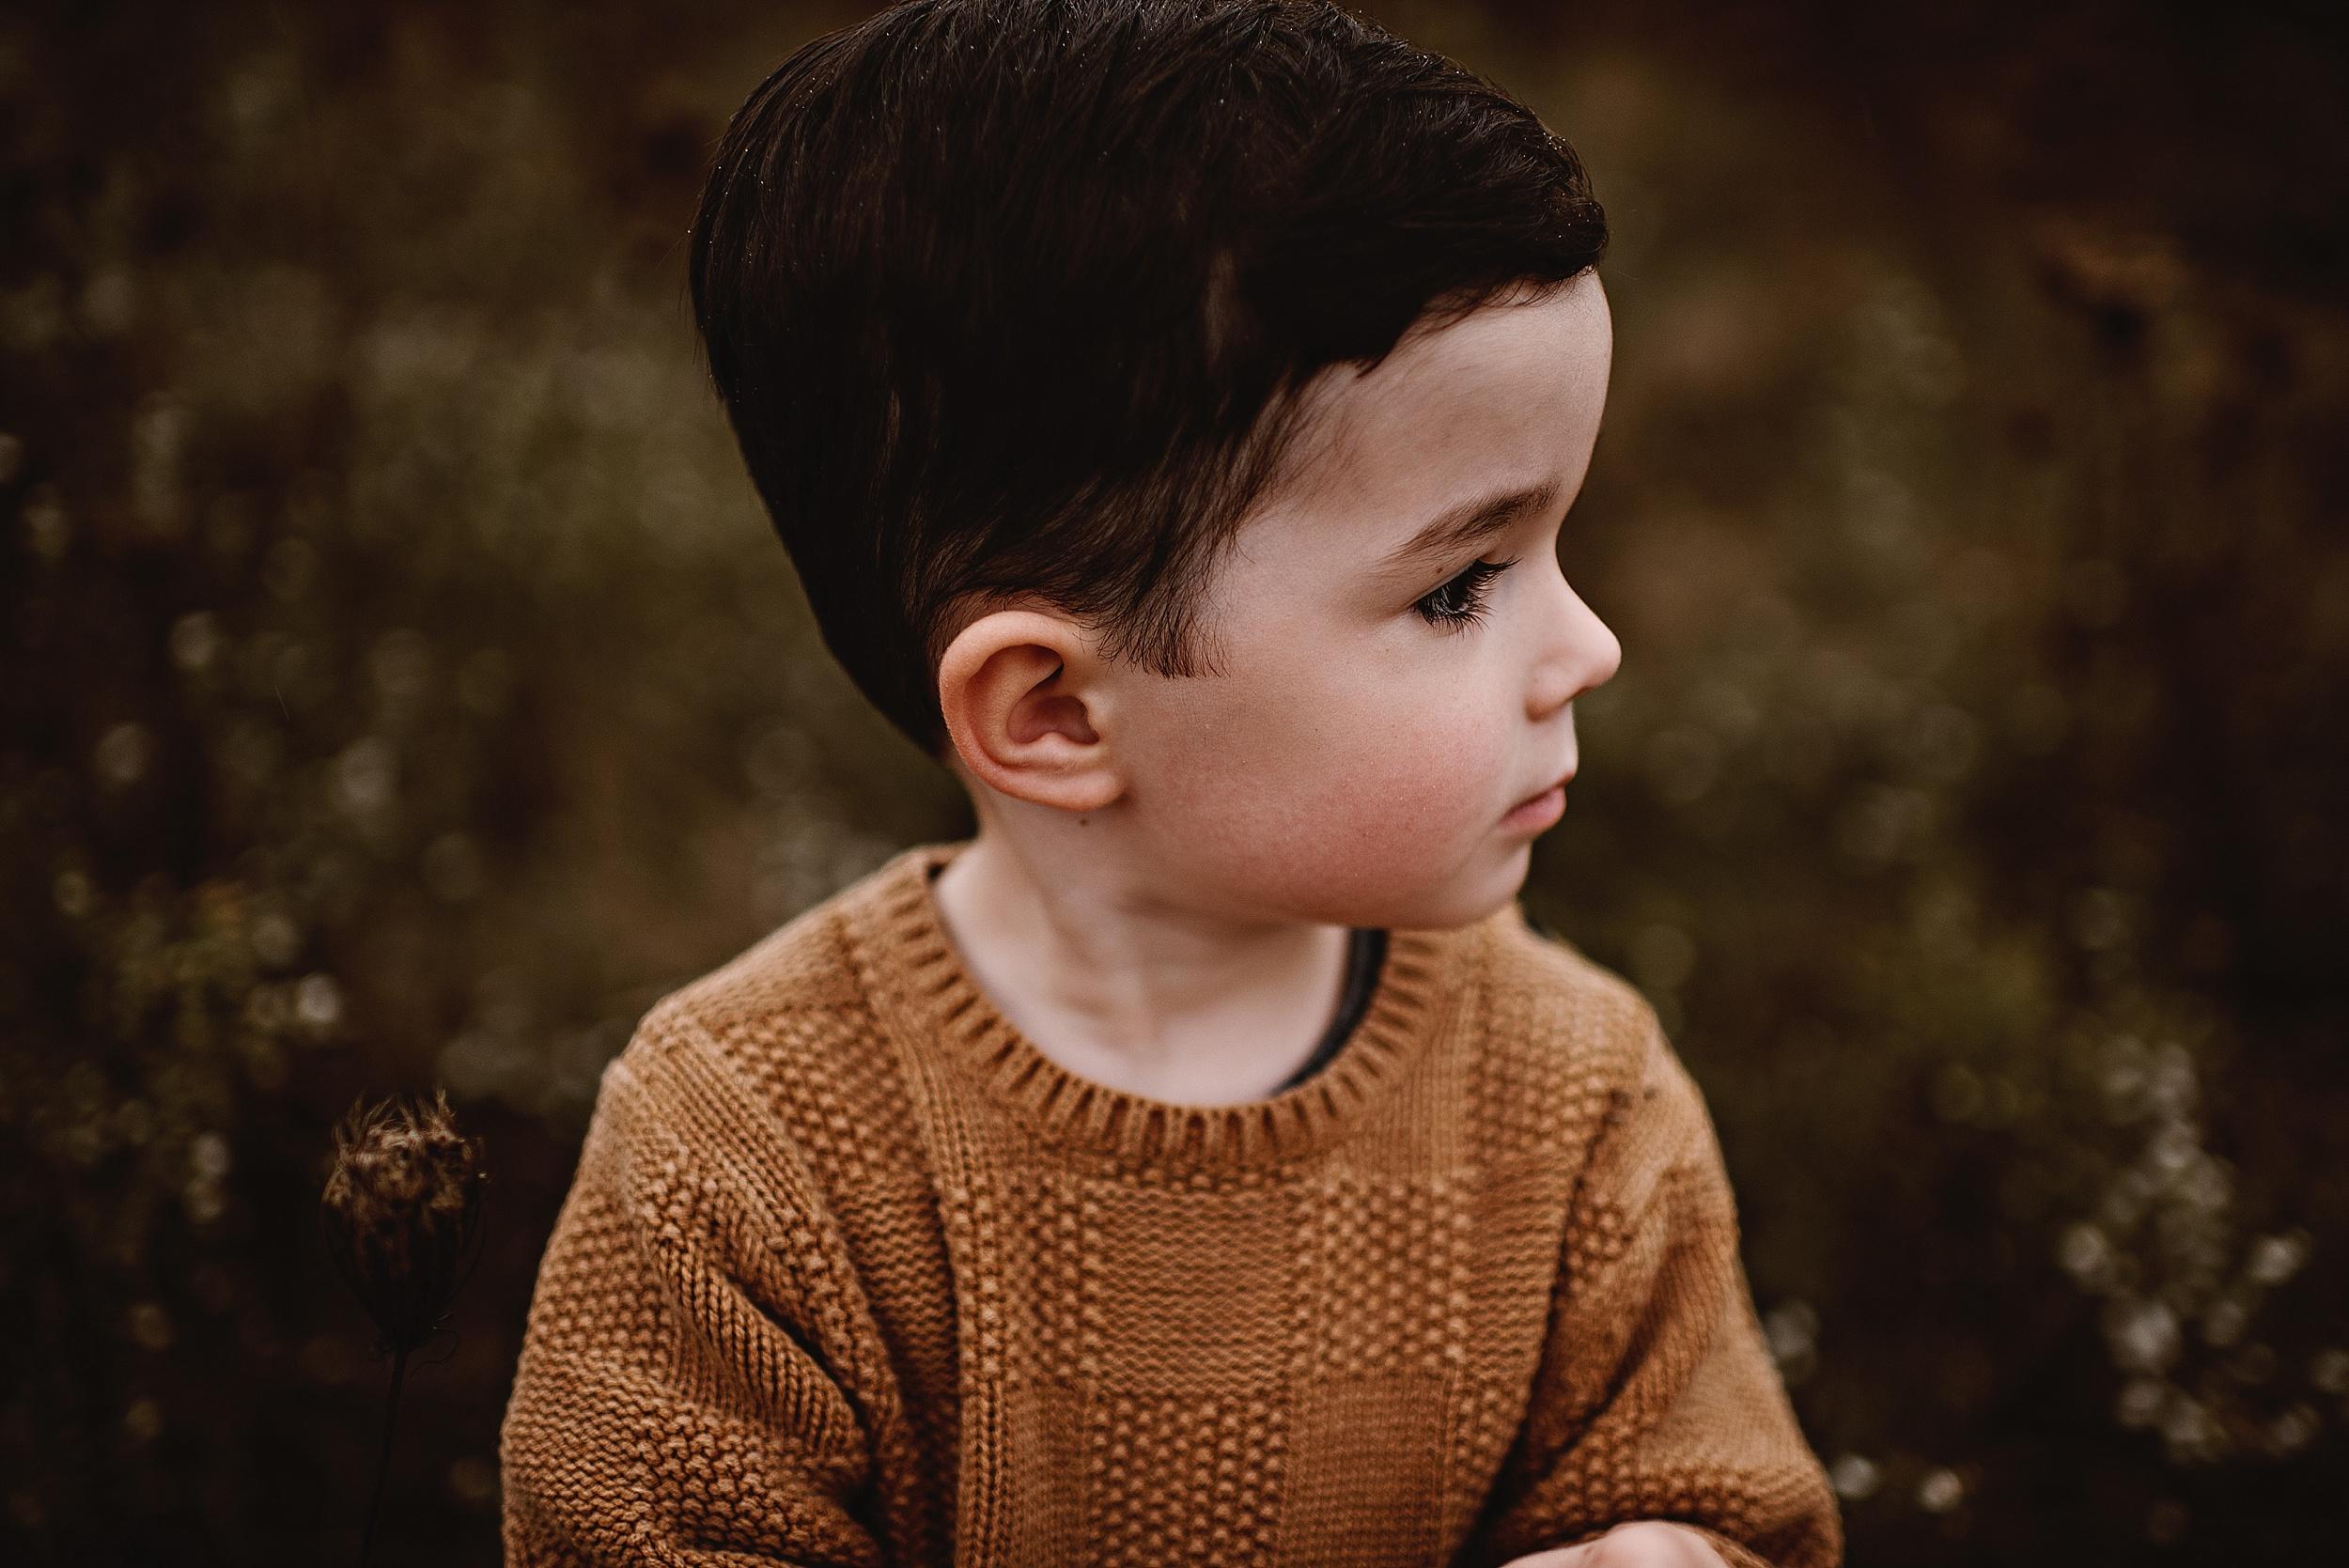 lauren-grayson-photography-portrait-artist-akron-cleveland-ohio-photographer-family-session-fields-sunset-fall_0190.jpg